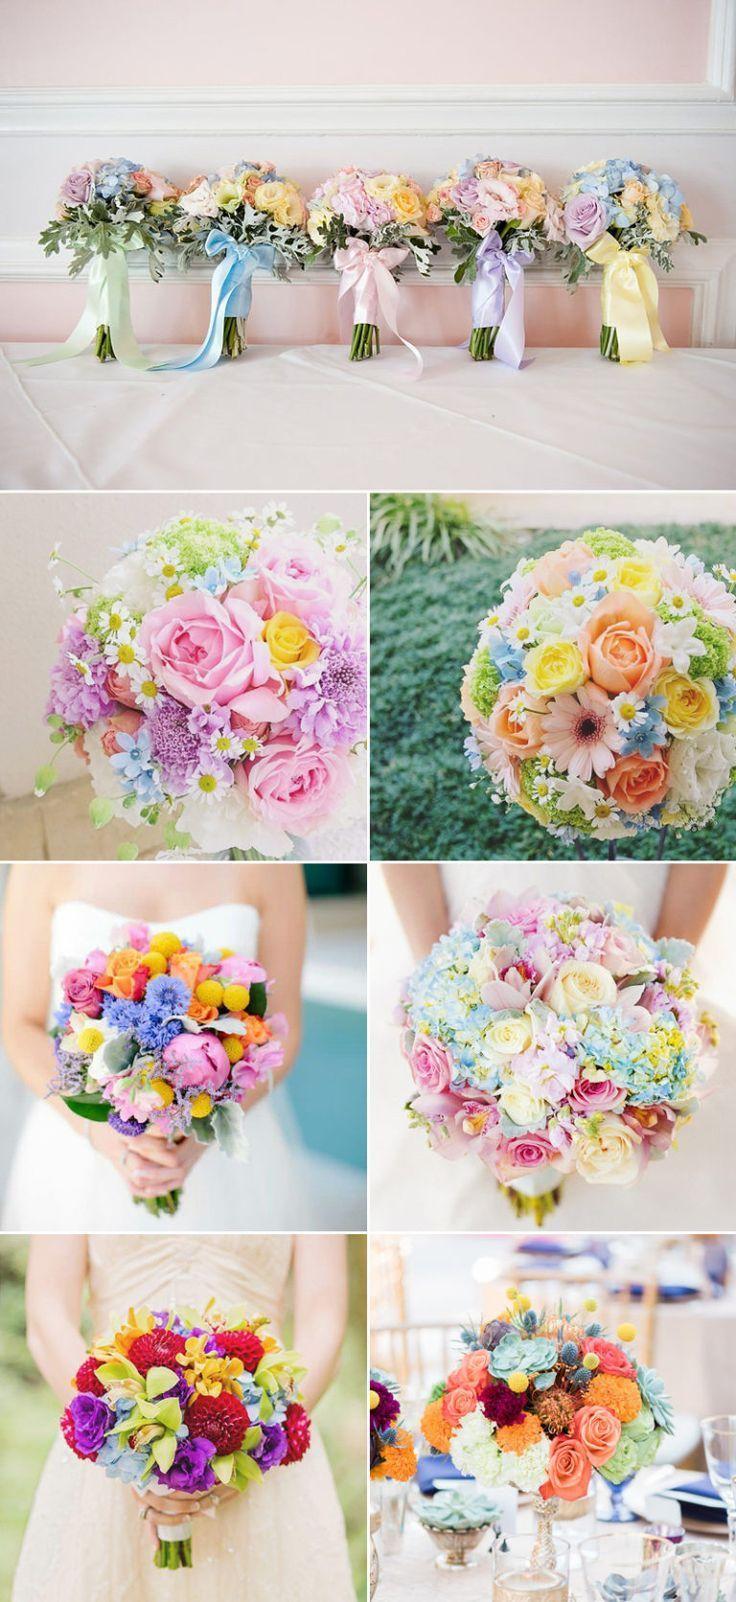 modern wedding alternative wedding Wedding bouquet yellow flowers wedding flowers rainbow wedding with fabric flowers fabric bouquet